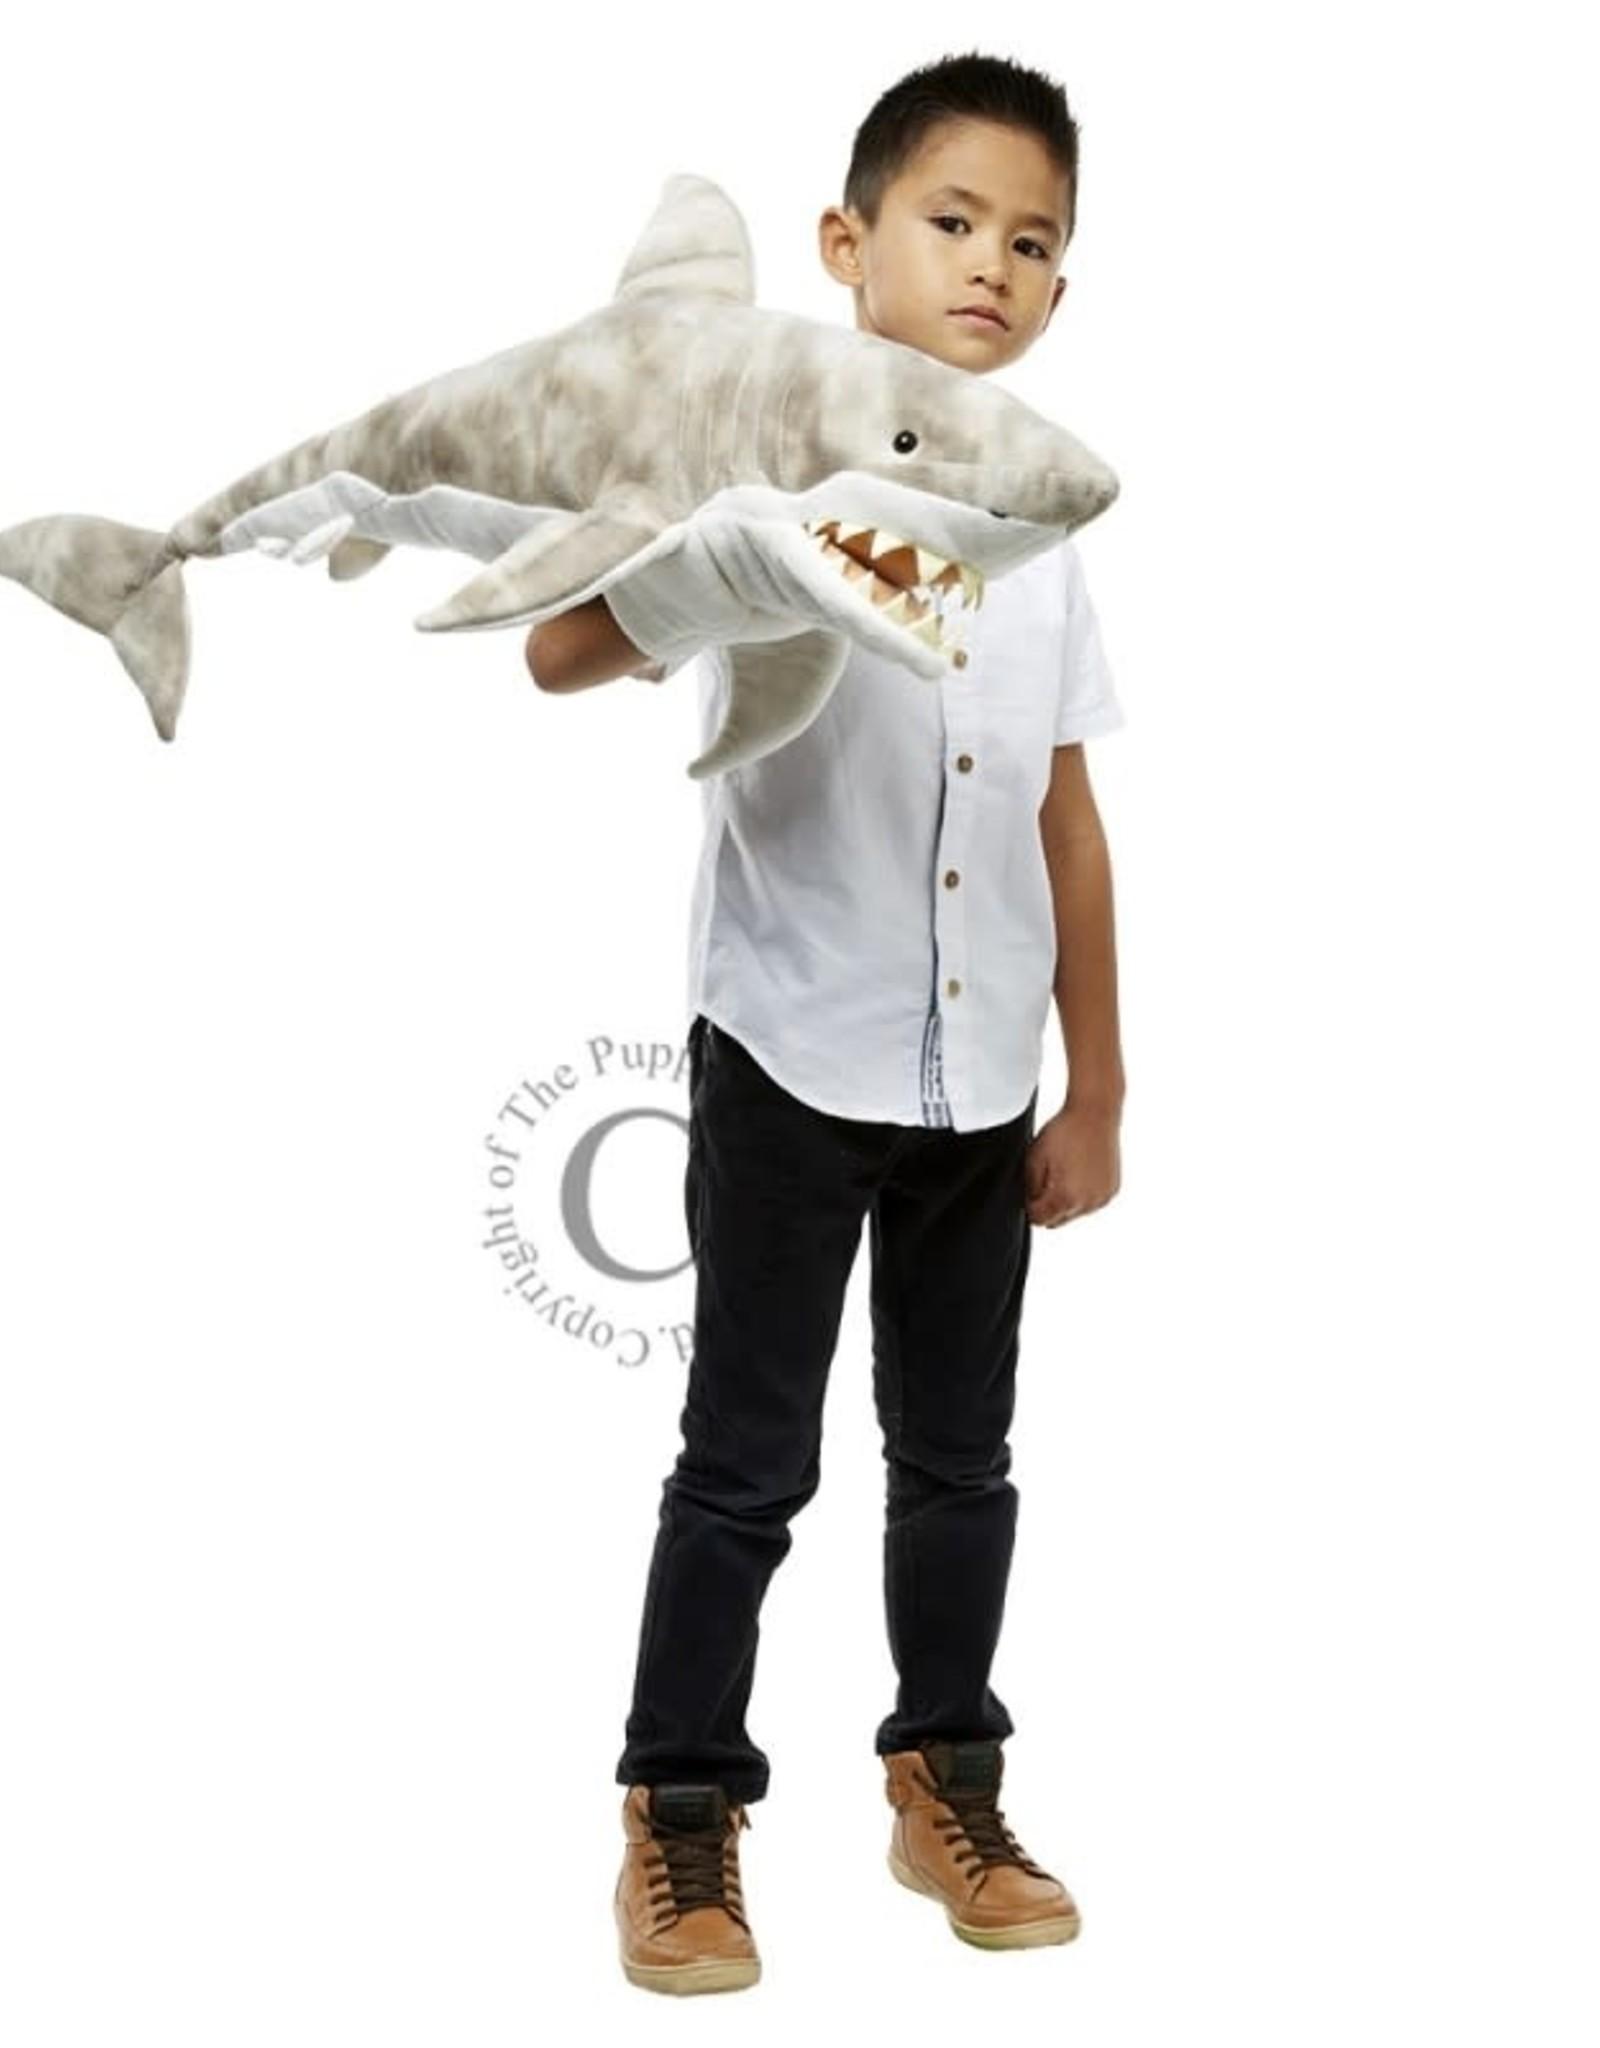 The Puppet Company Puppet Plush Large Shark